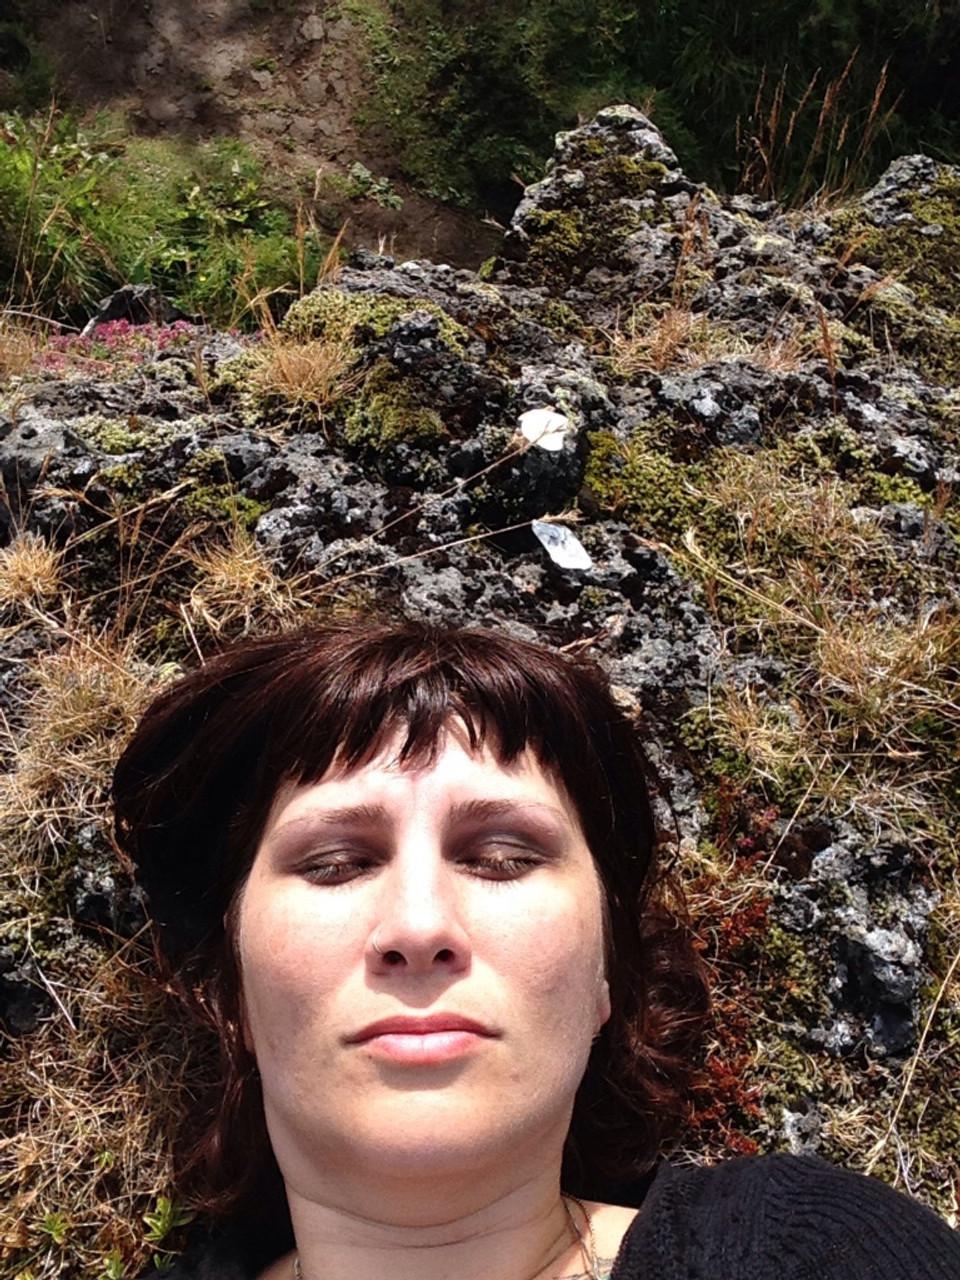 Dreaming in the Elfgarden, Harfnarfjodur, Iceland